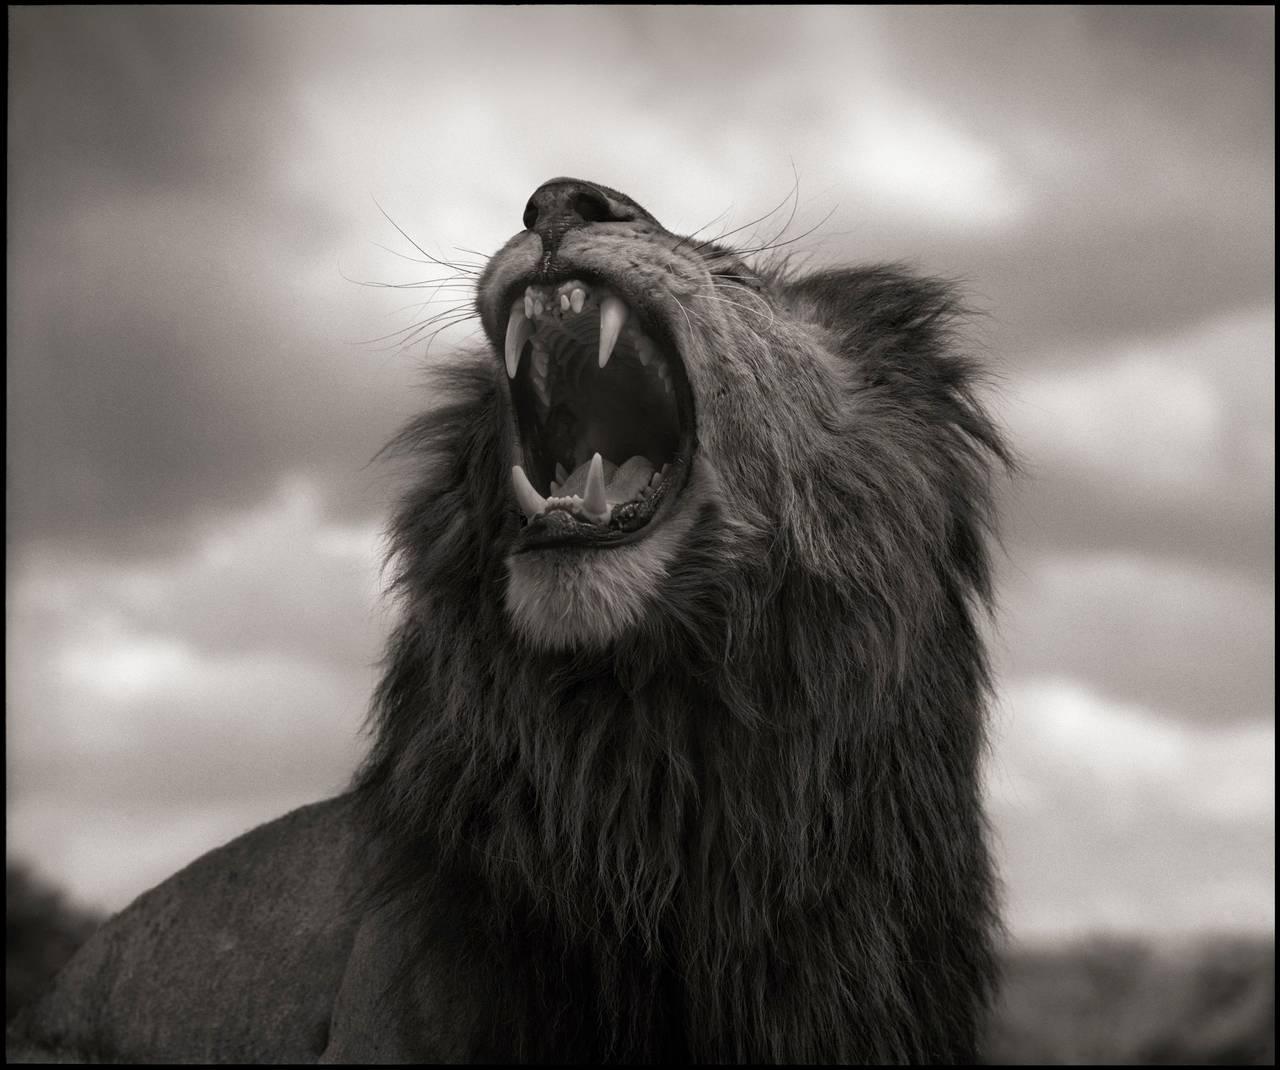 Nick Brandt - Lion Roar, Maasai Mara, Photograph: For Sale ...